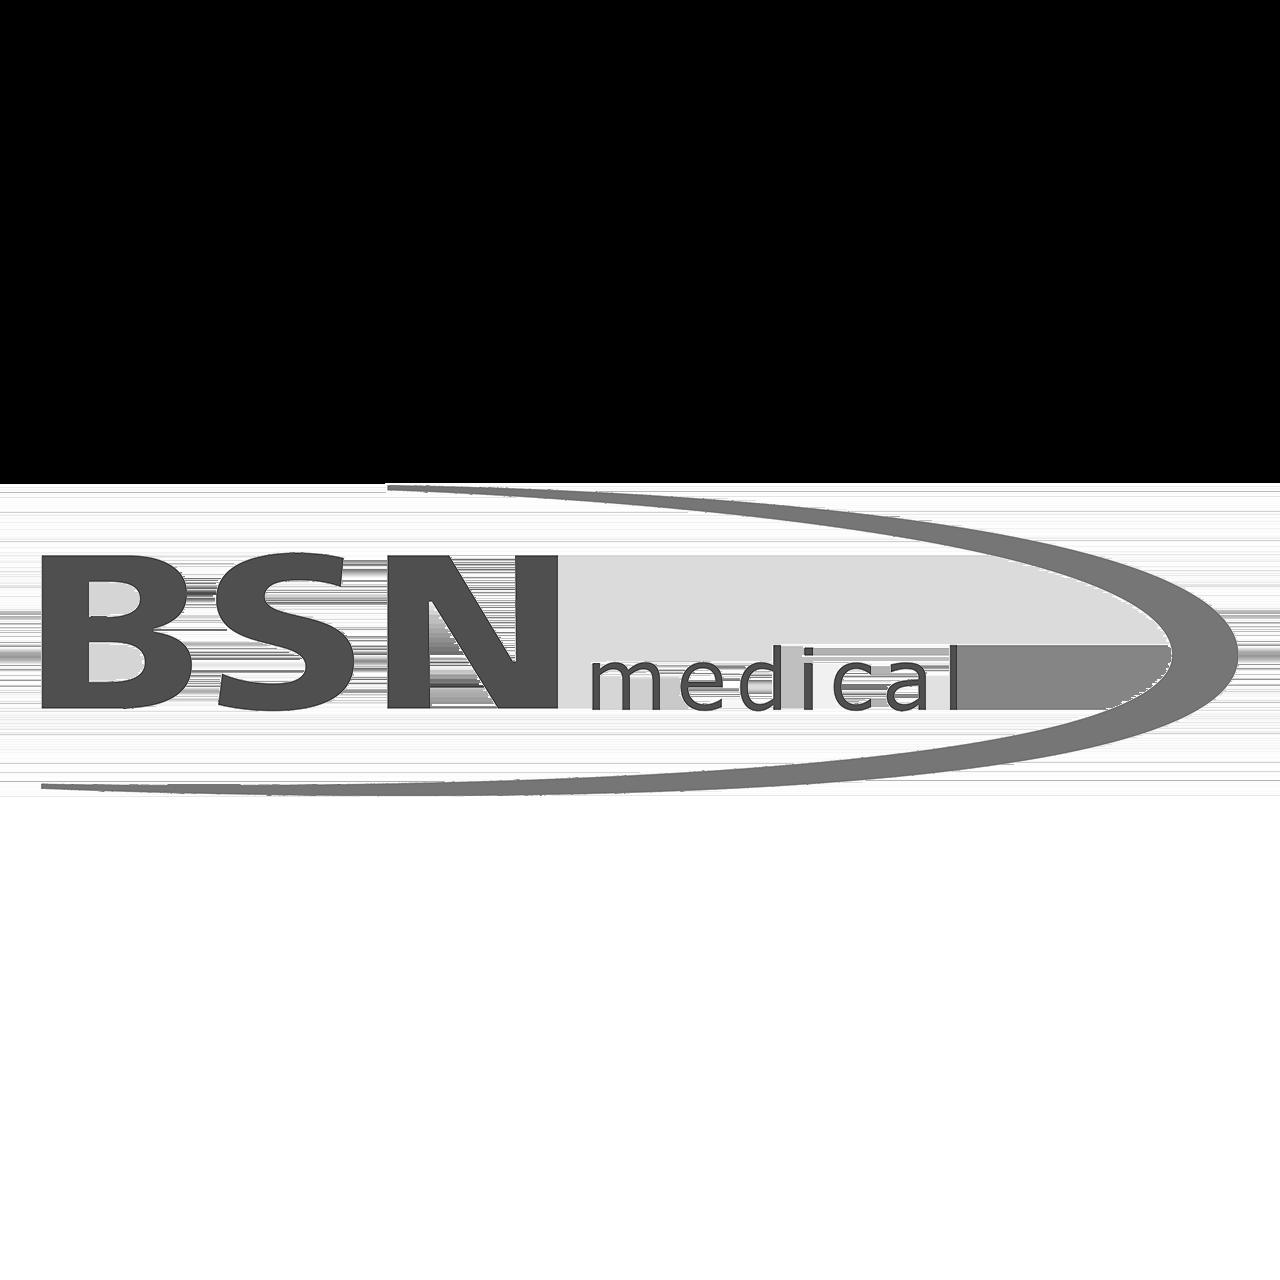 Logo BSN medical, black & white